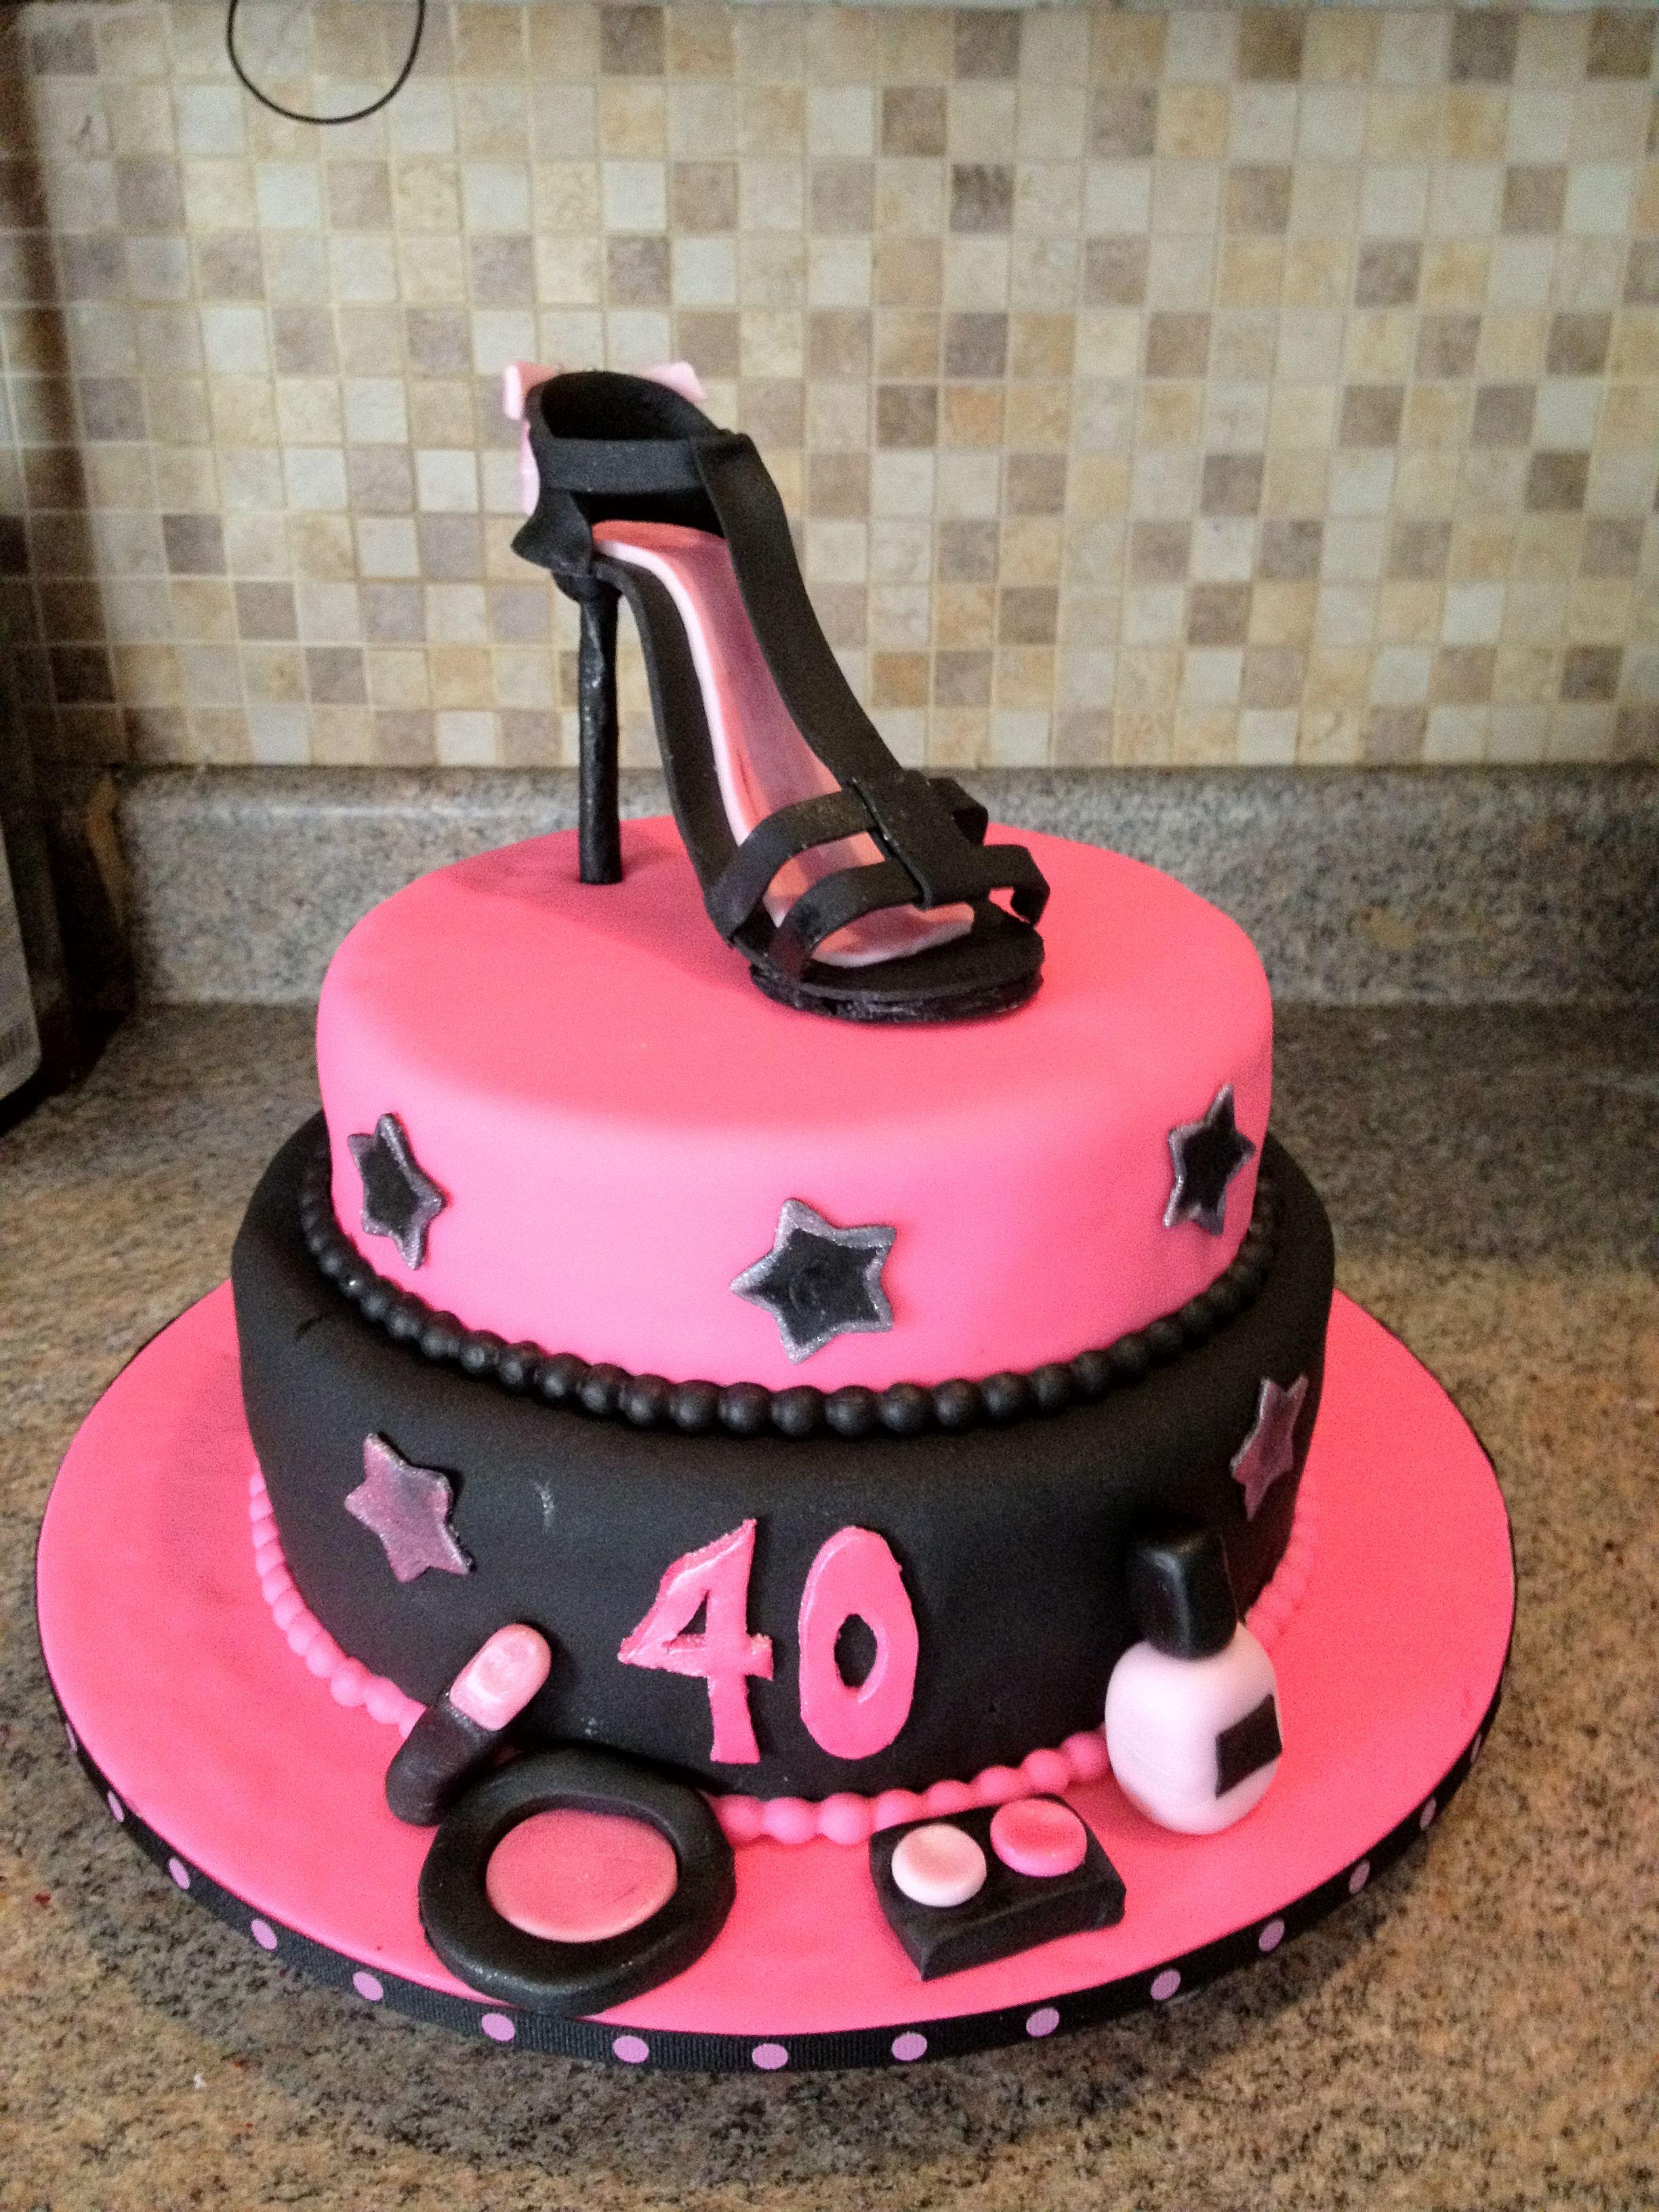 40th birthday cake 40th birthday cake for women